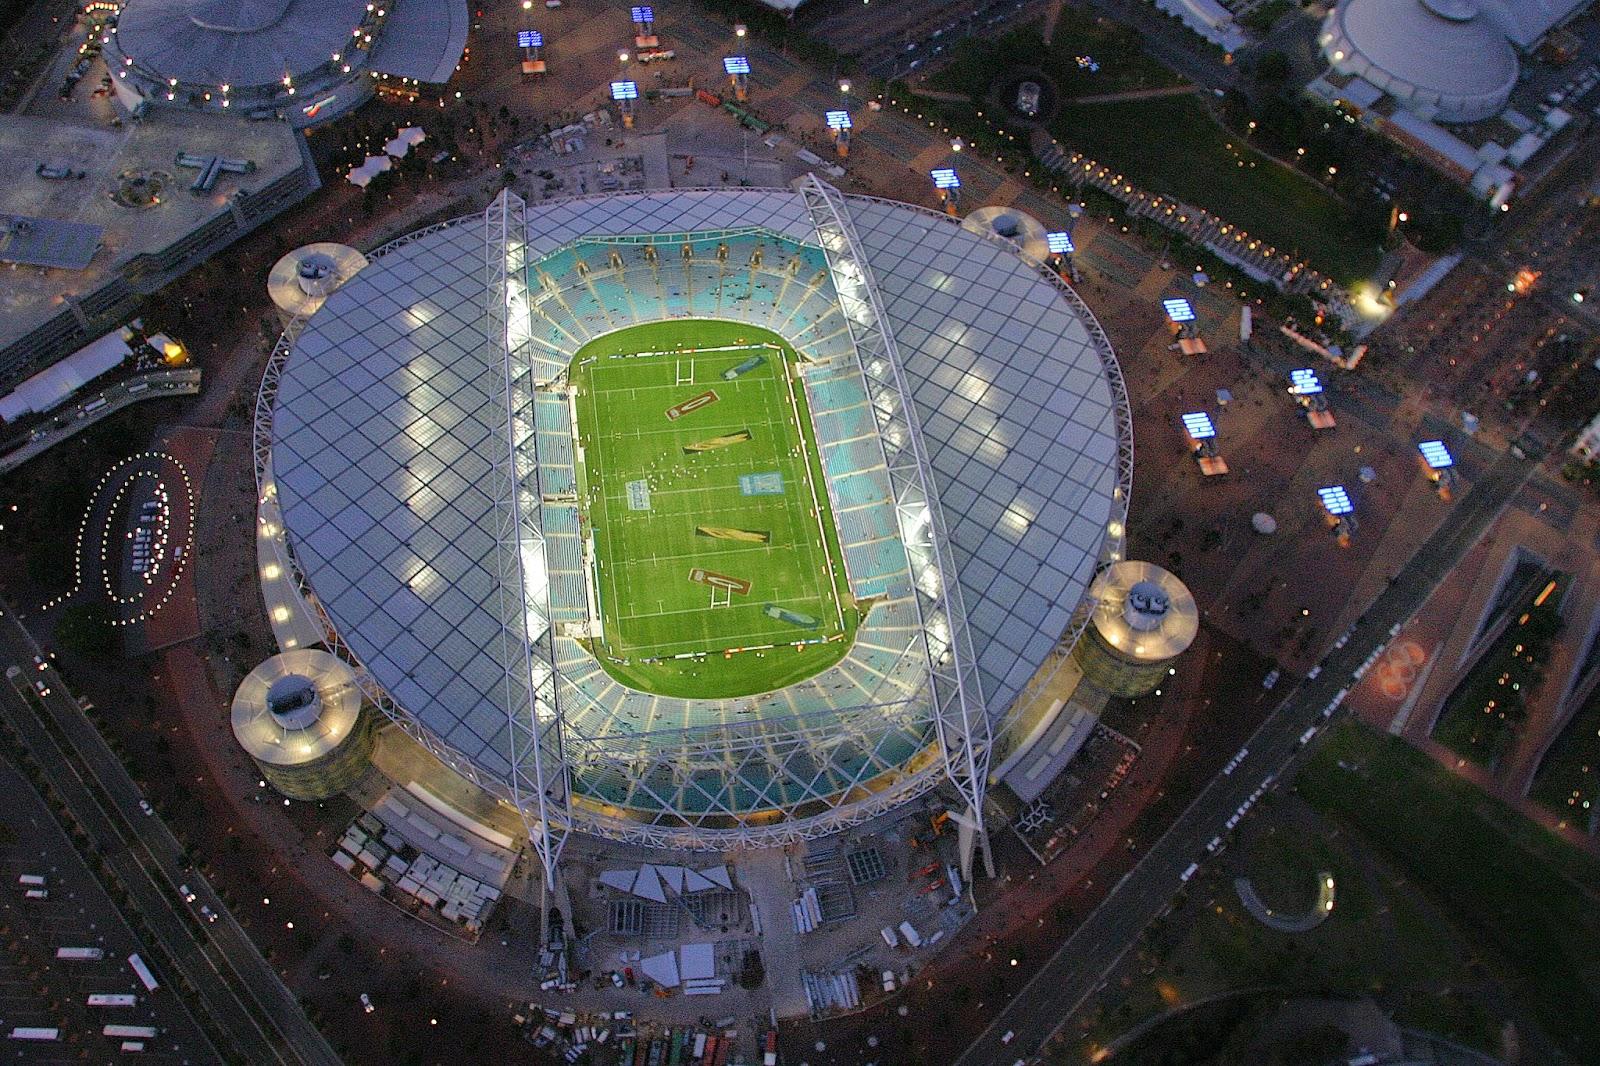 foto aerea dello Stadium Australia